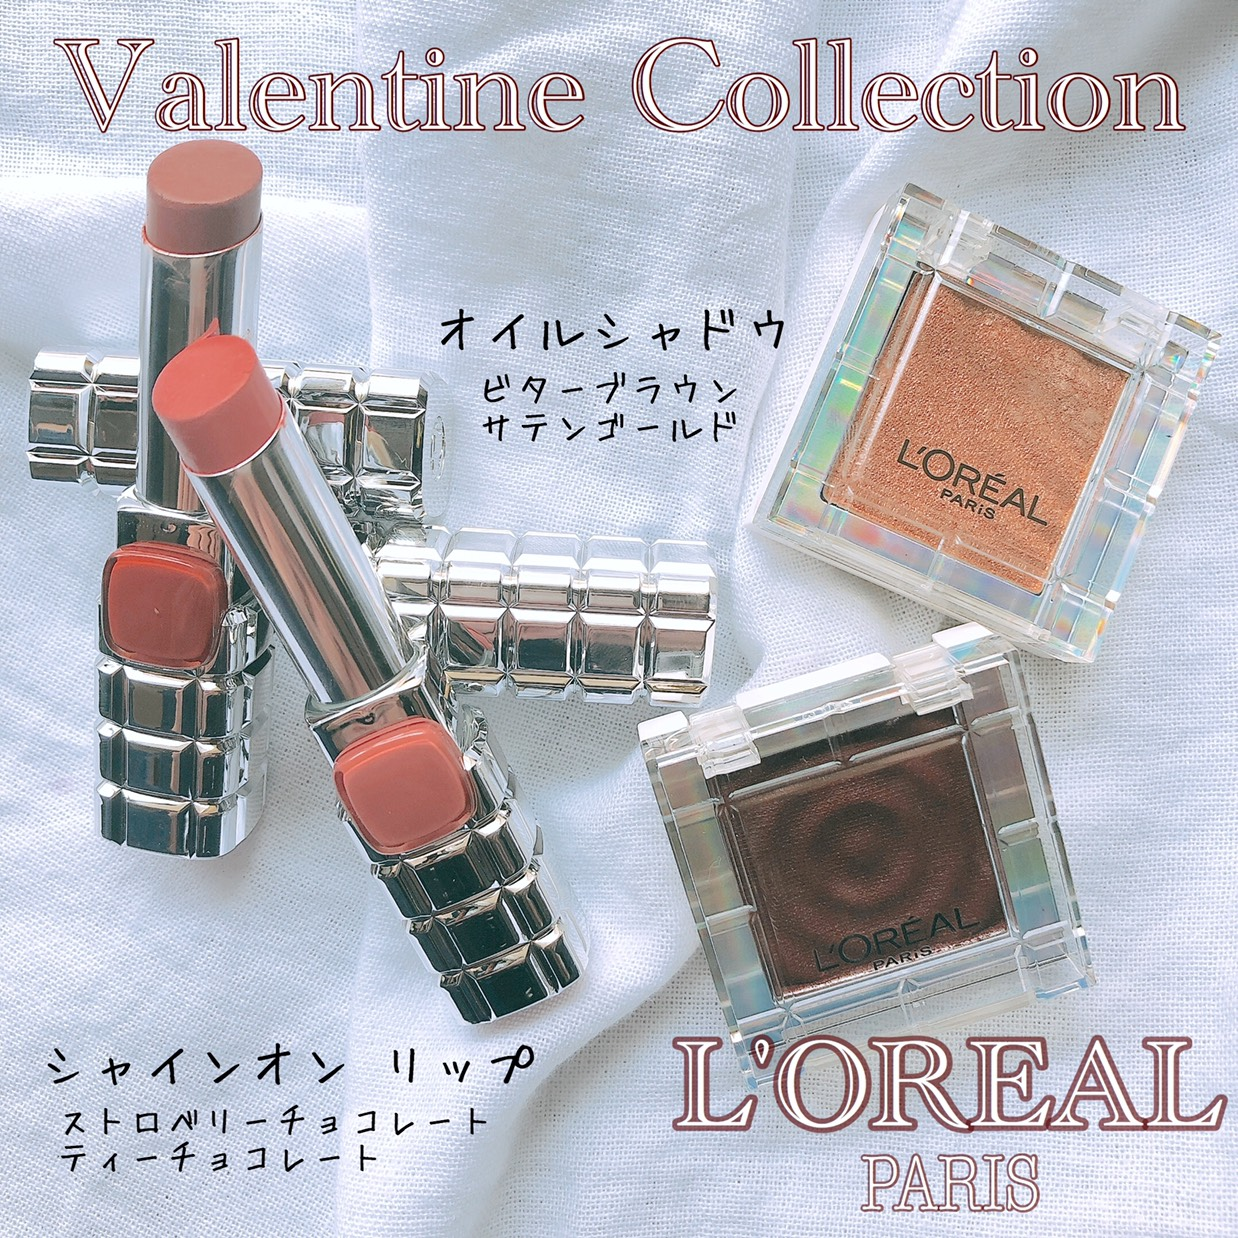 L'OREAL PARIS バレンタインコレクション